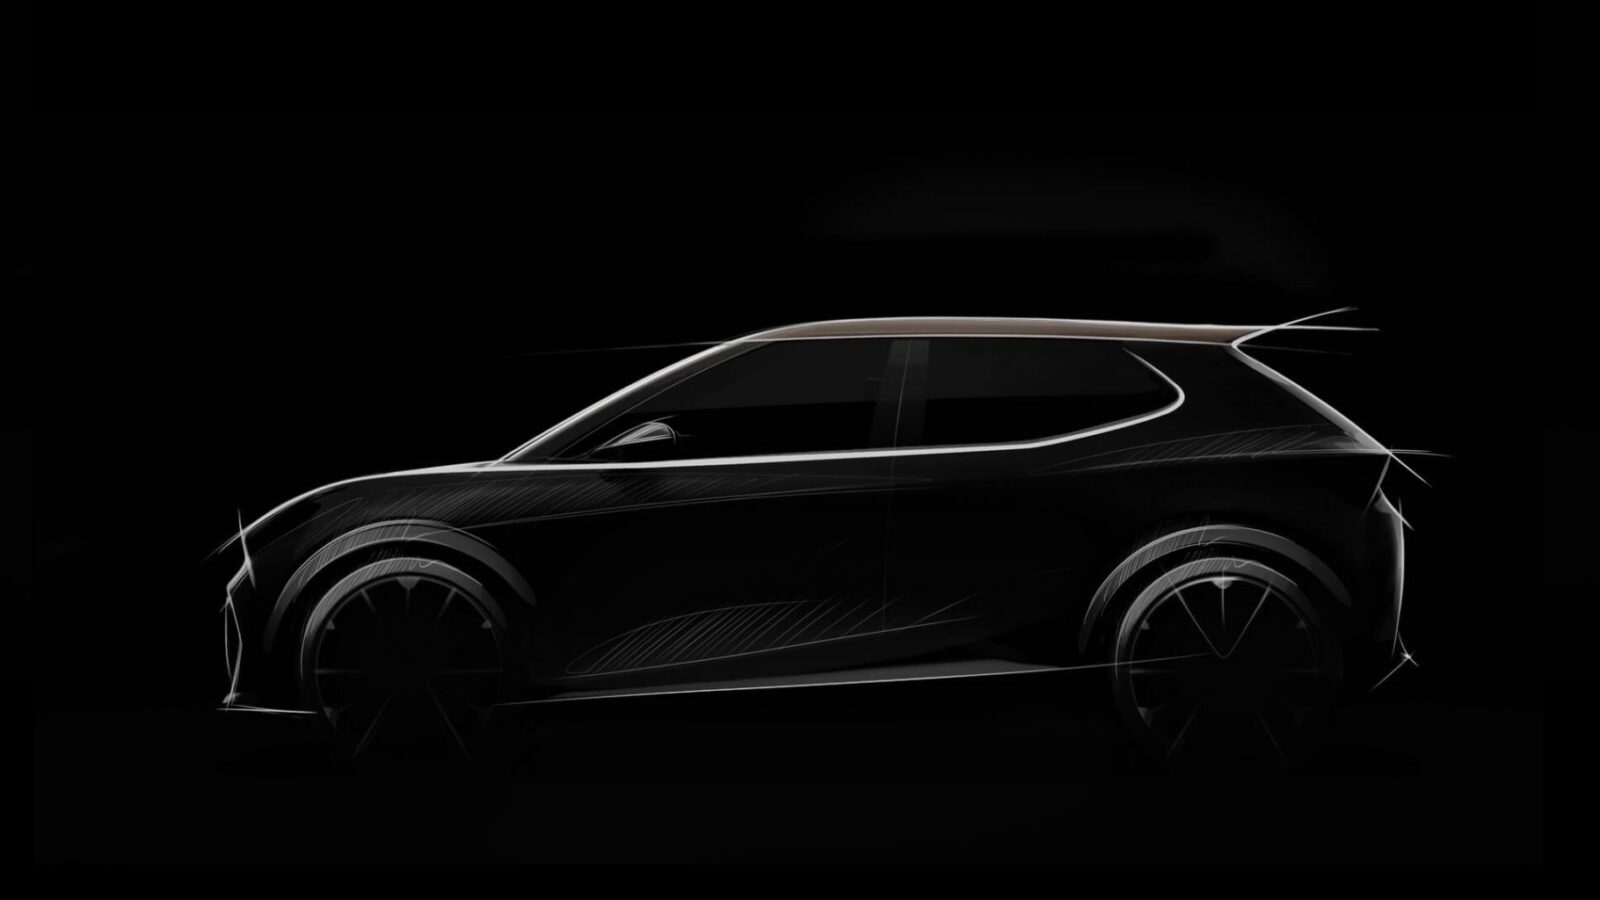 2025 Seat Electric Urban Car Teaser 1700x956